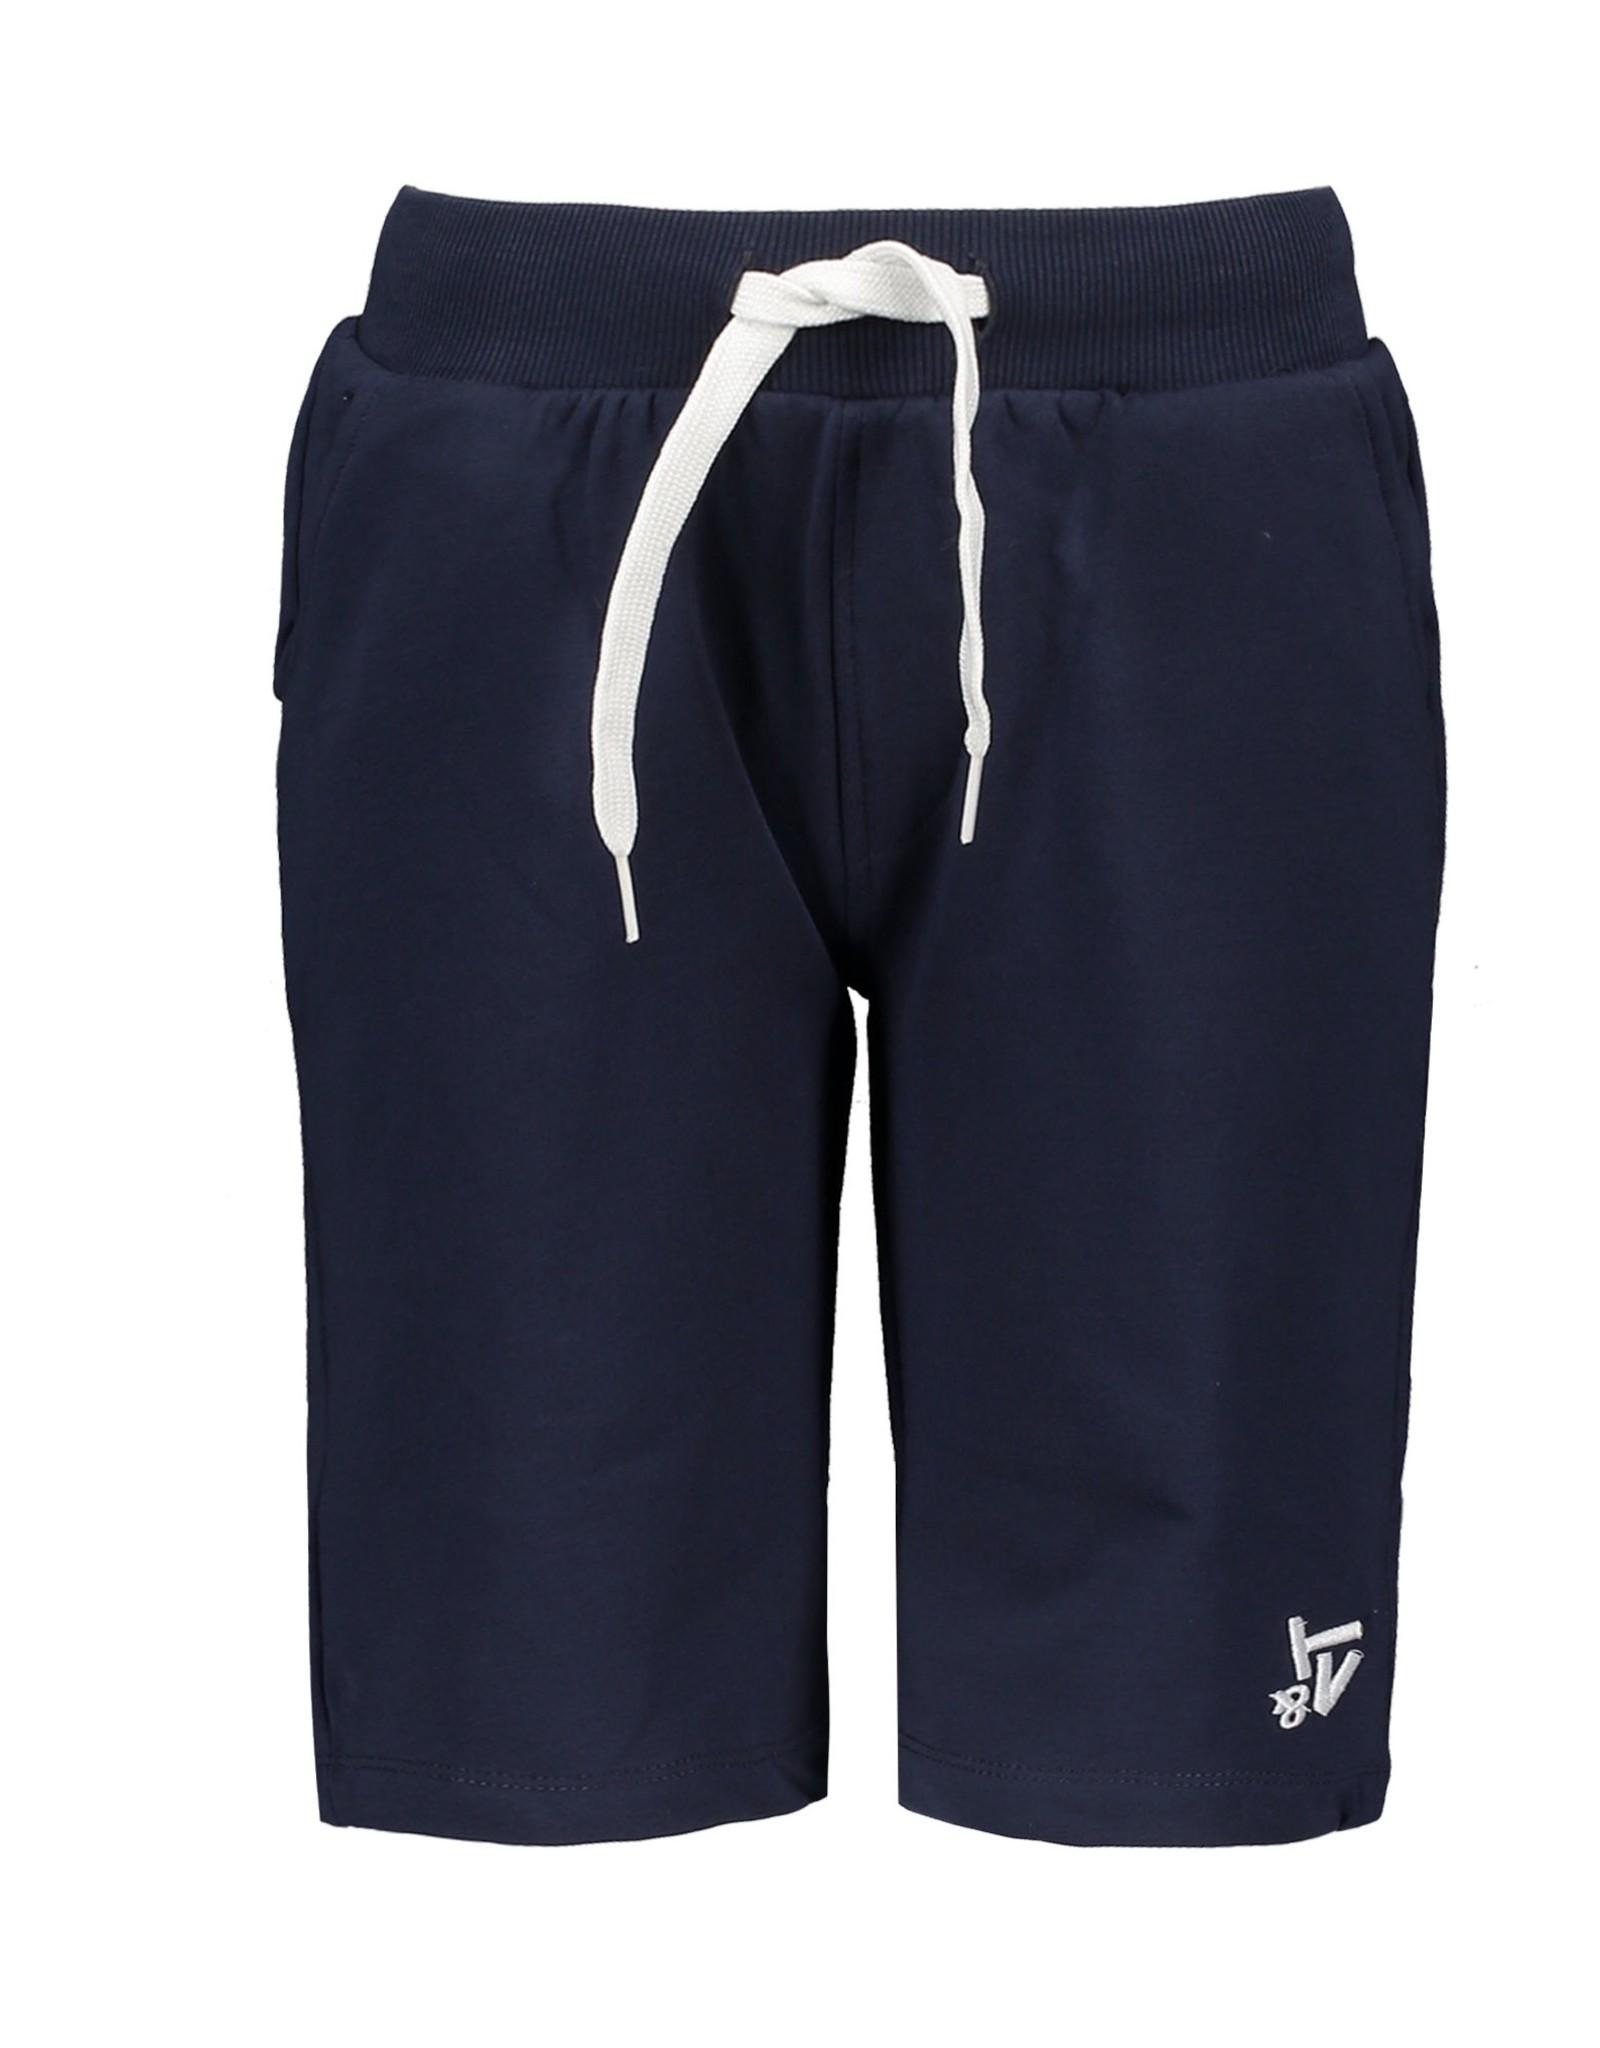 Tygo & vito X004-6680 Short